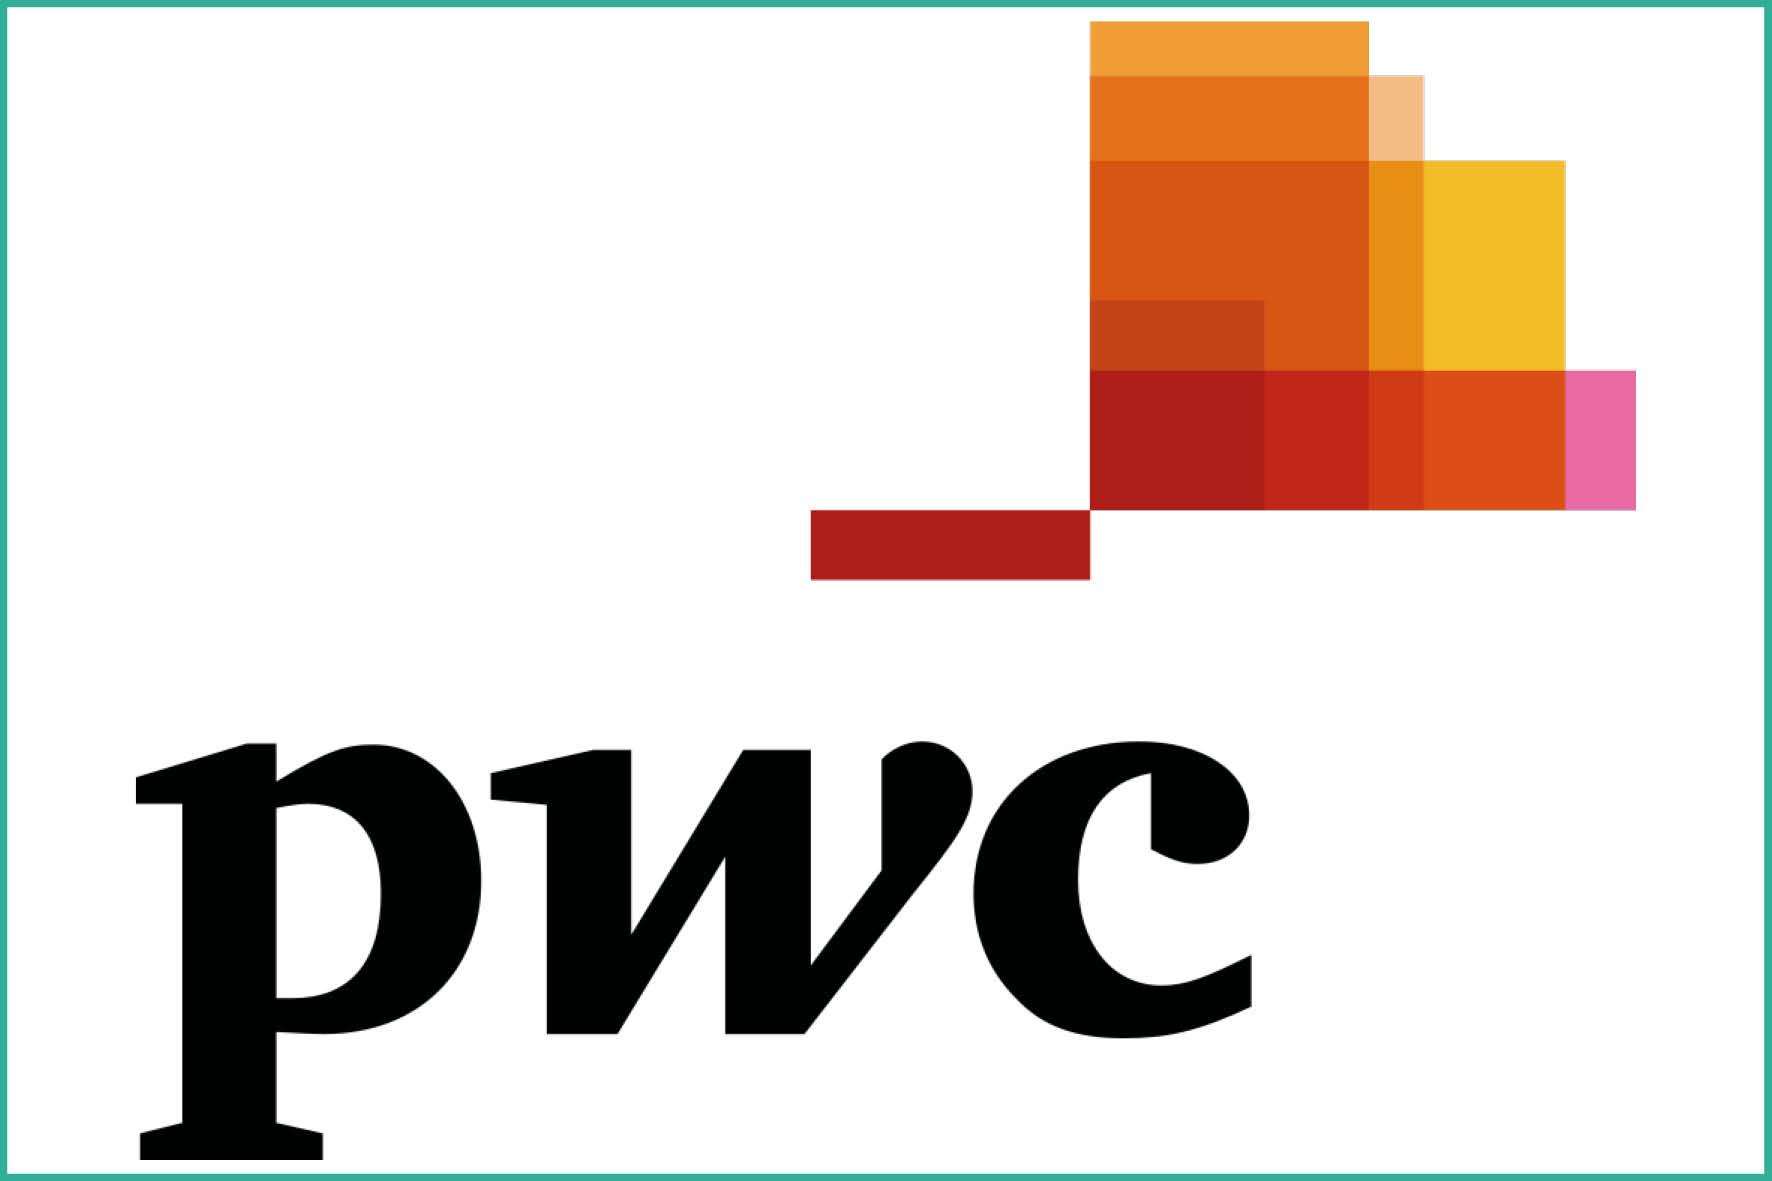 bcc-pwc